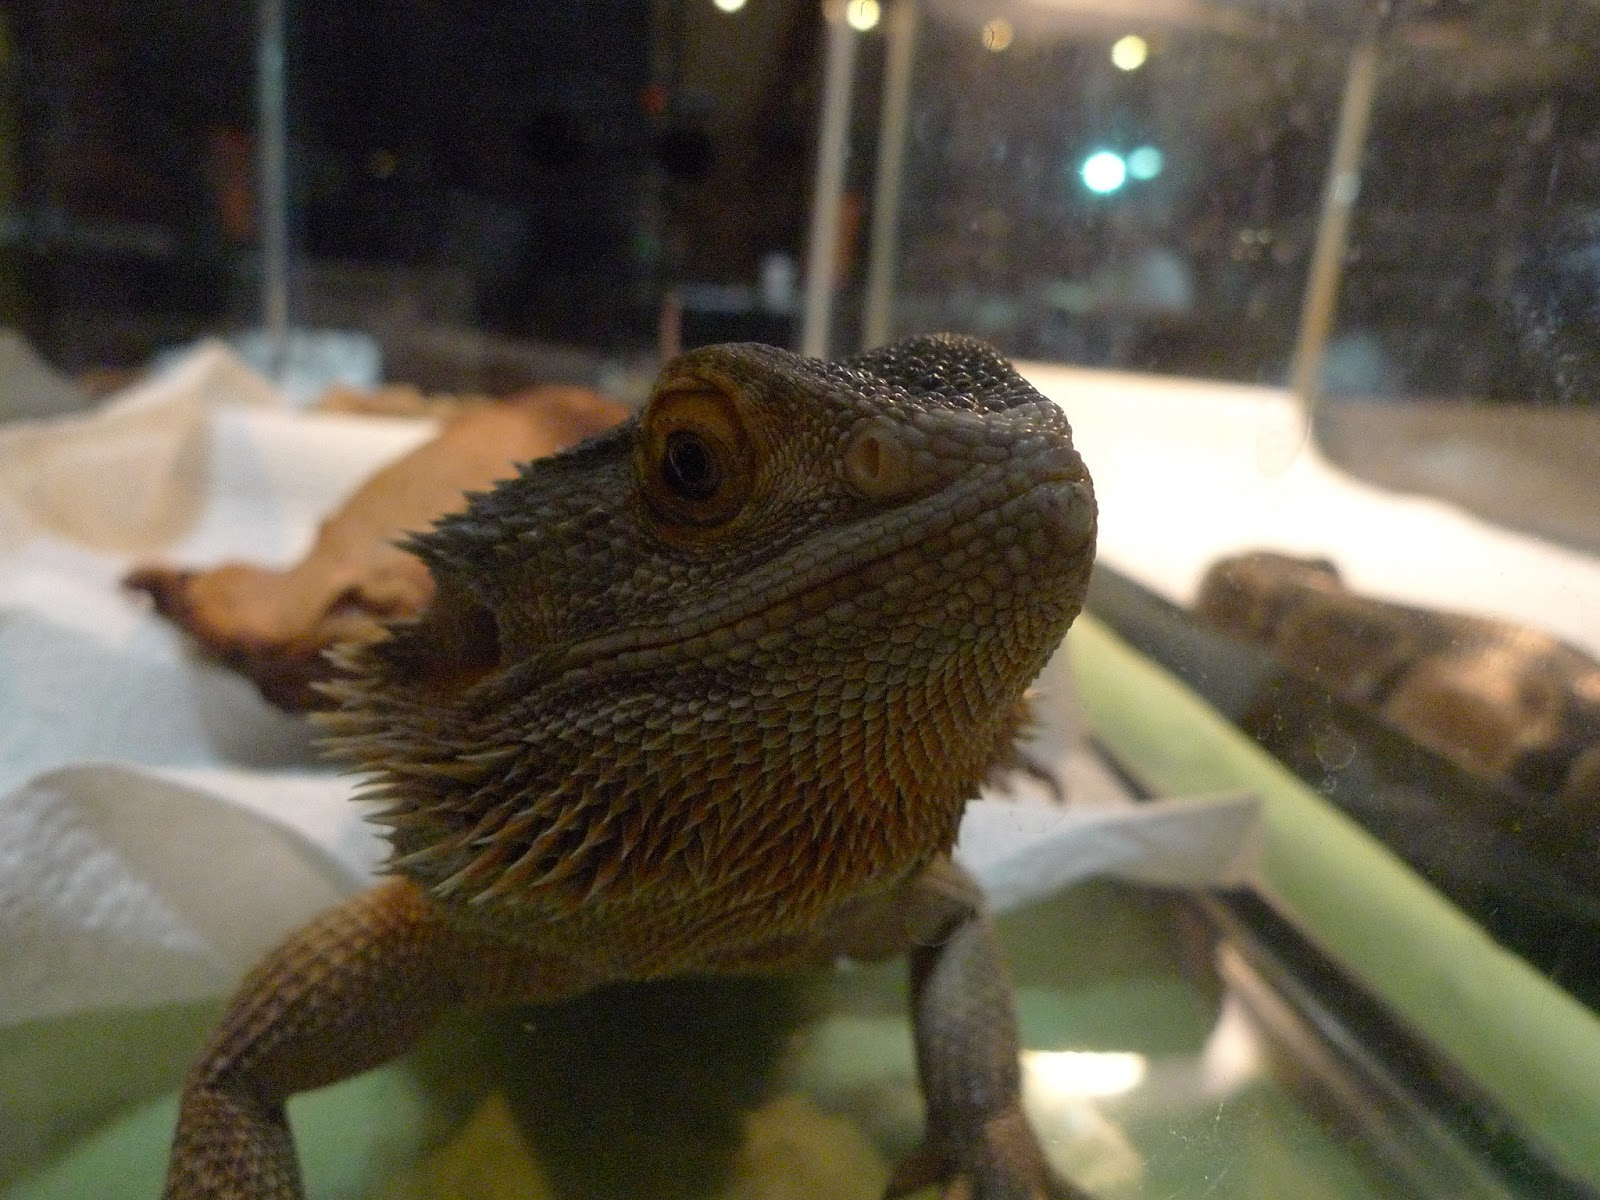 Paraherpetology: Repticon Dallas, Part 5: DFW Reptile Rescue